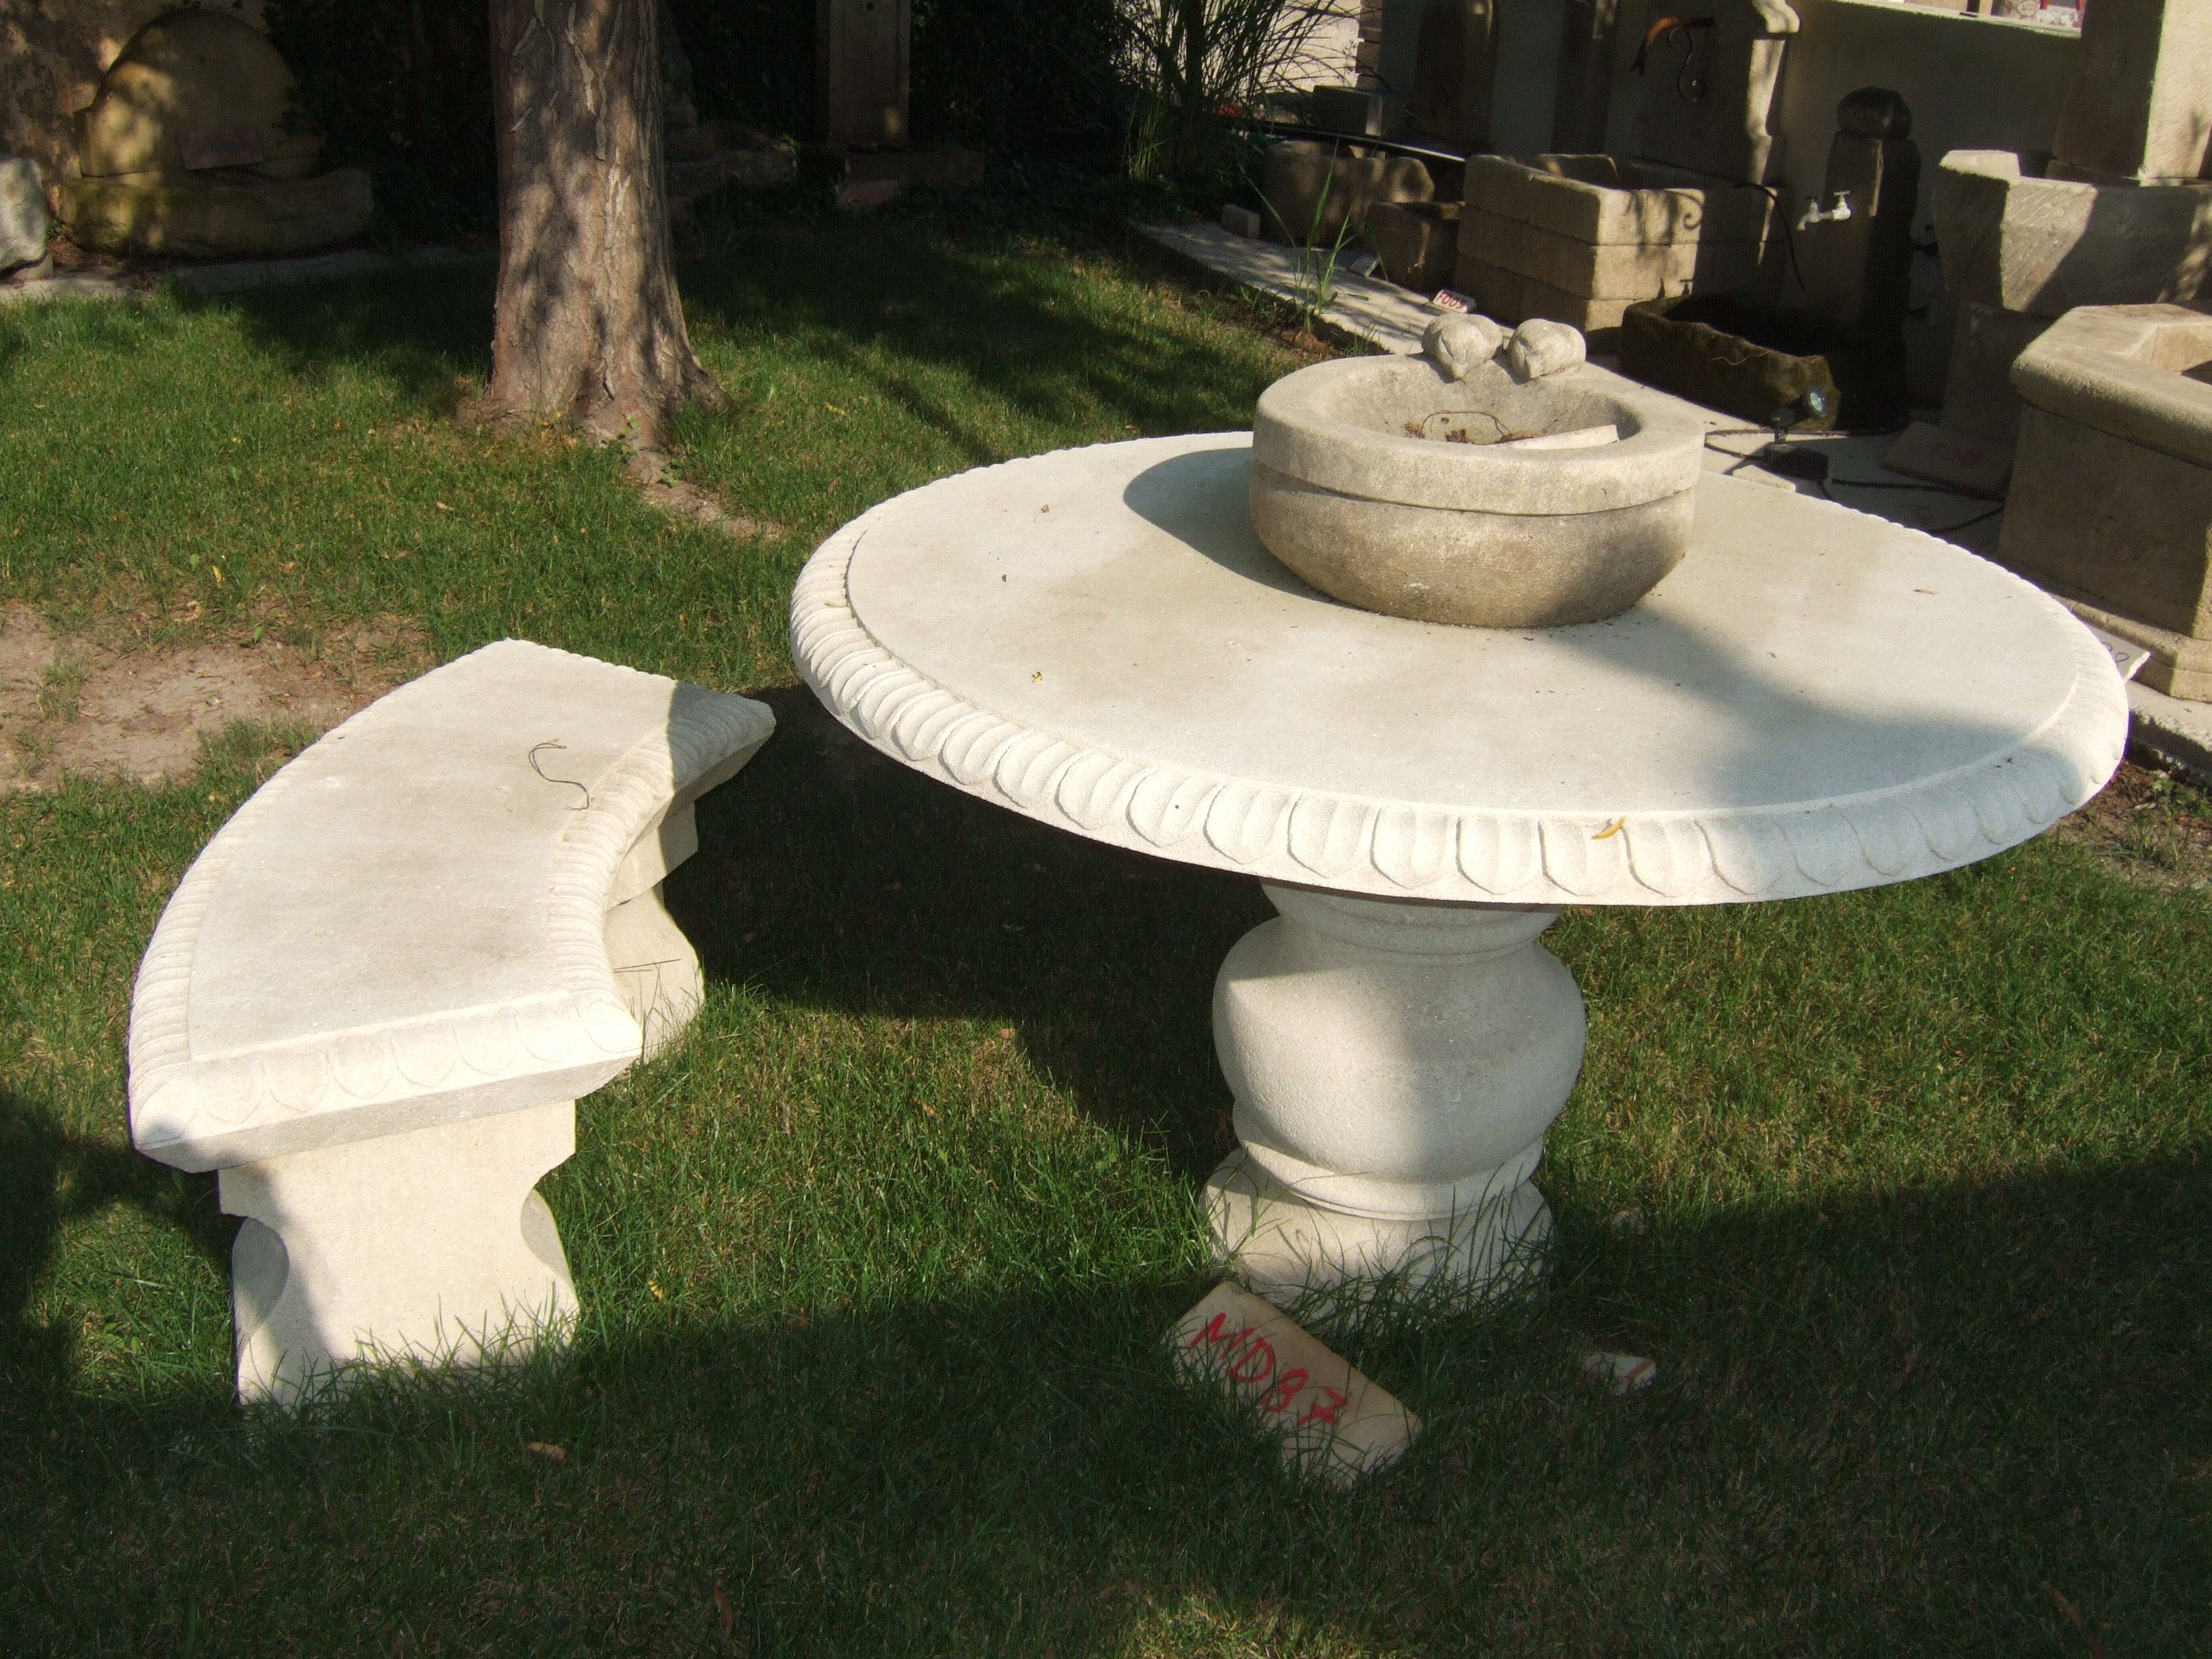 933fa216eff13fa5ce6bdd0bbacf2890 Unique De Petite Table Ronde De Jardin Schème